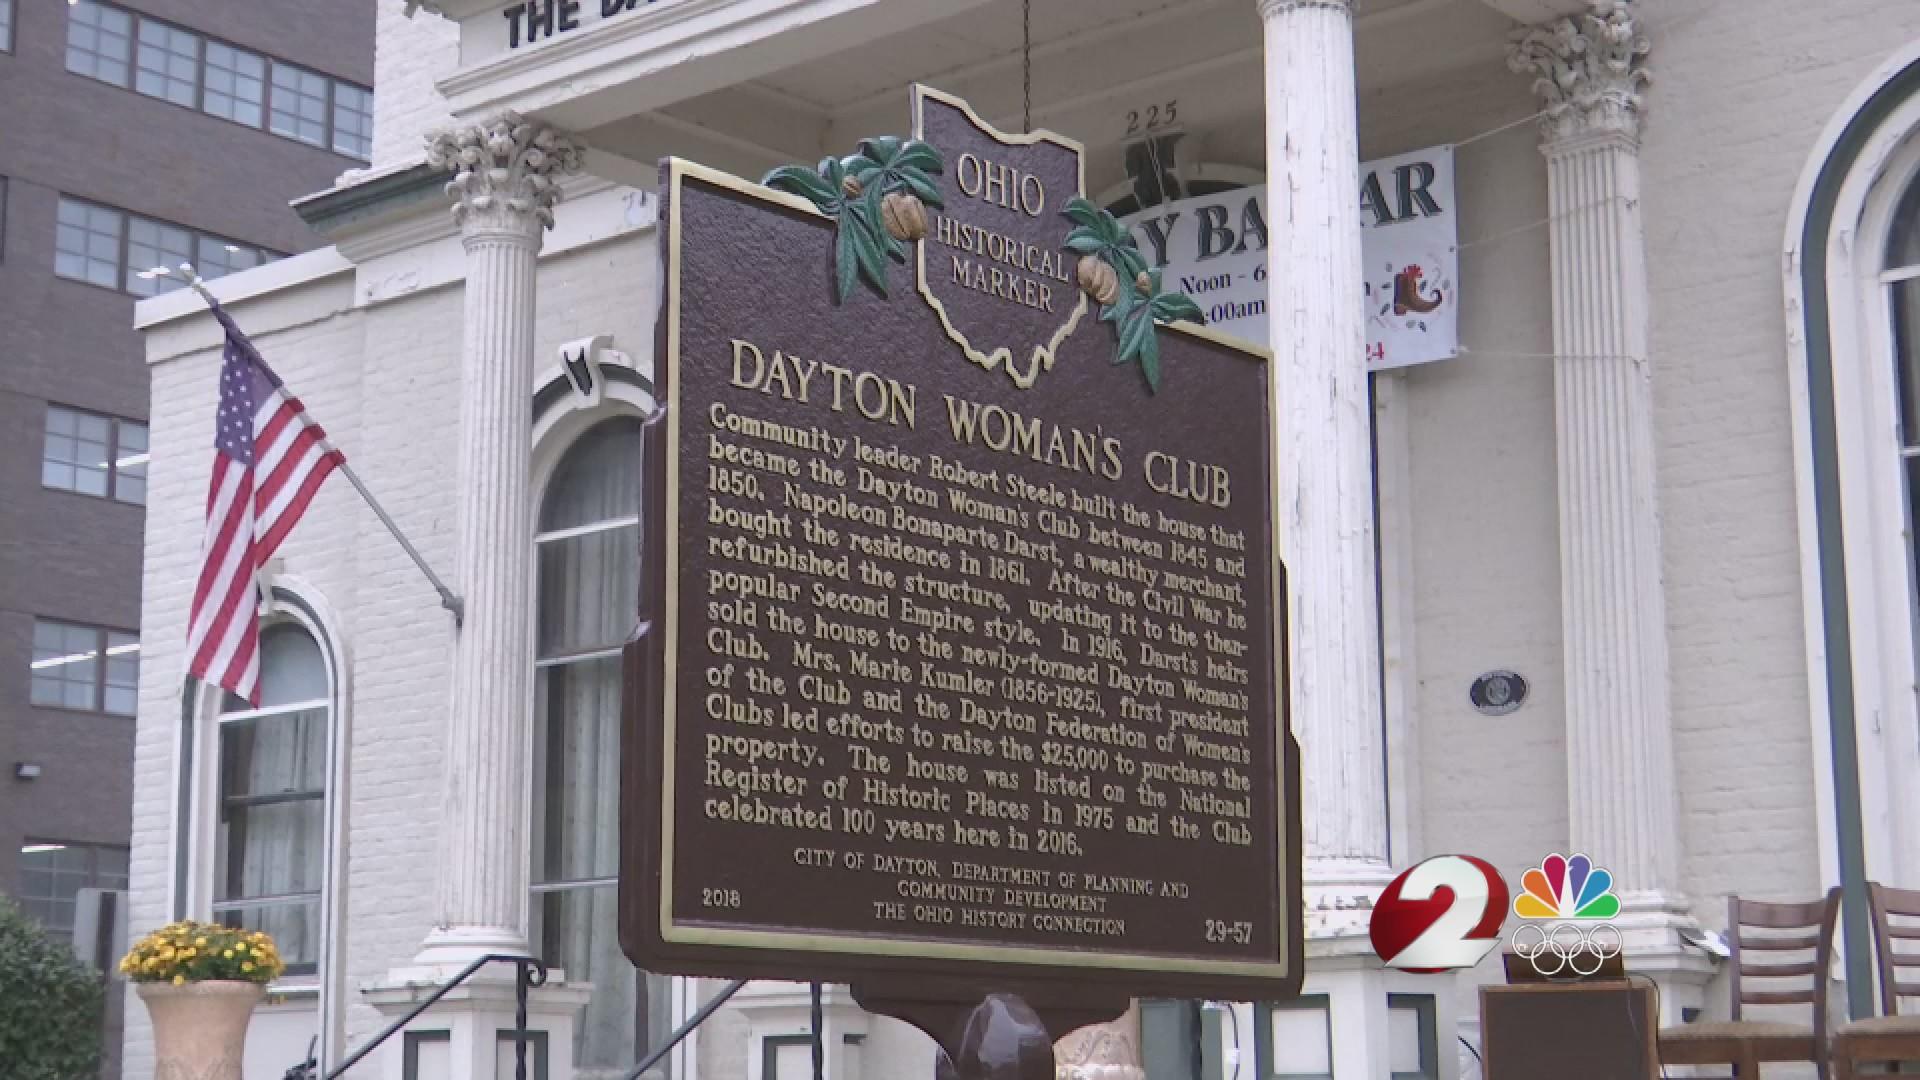 Dayton Woman's Club receives historical marker